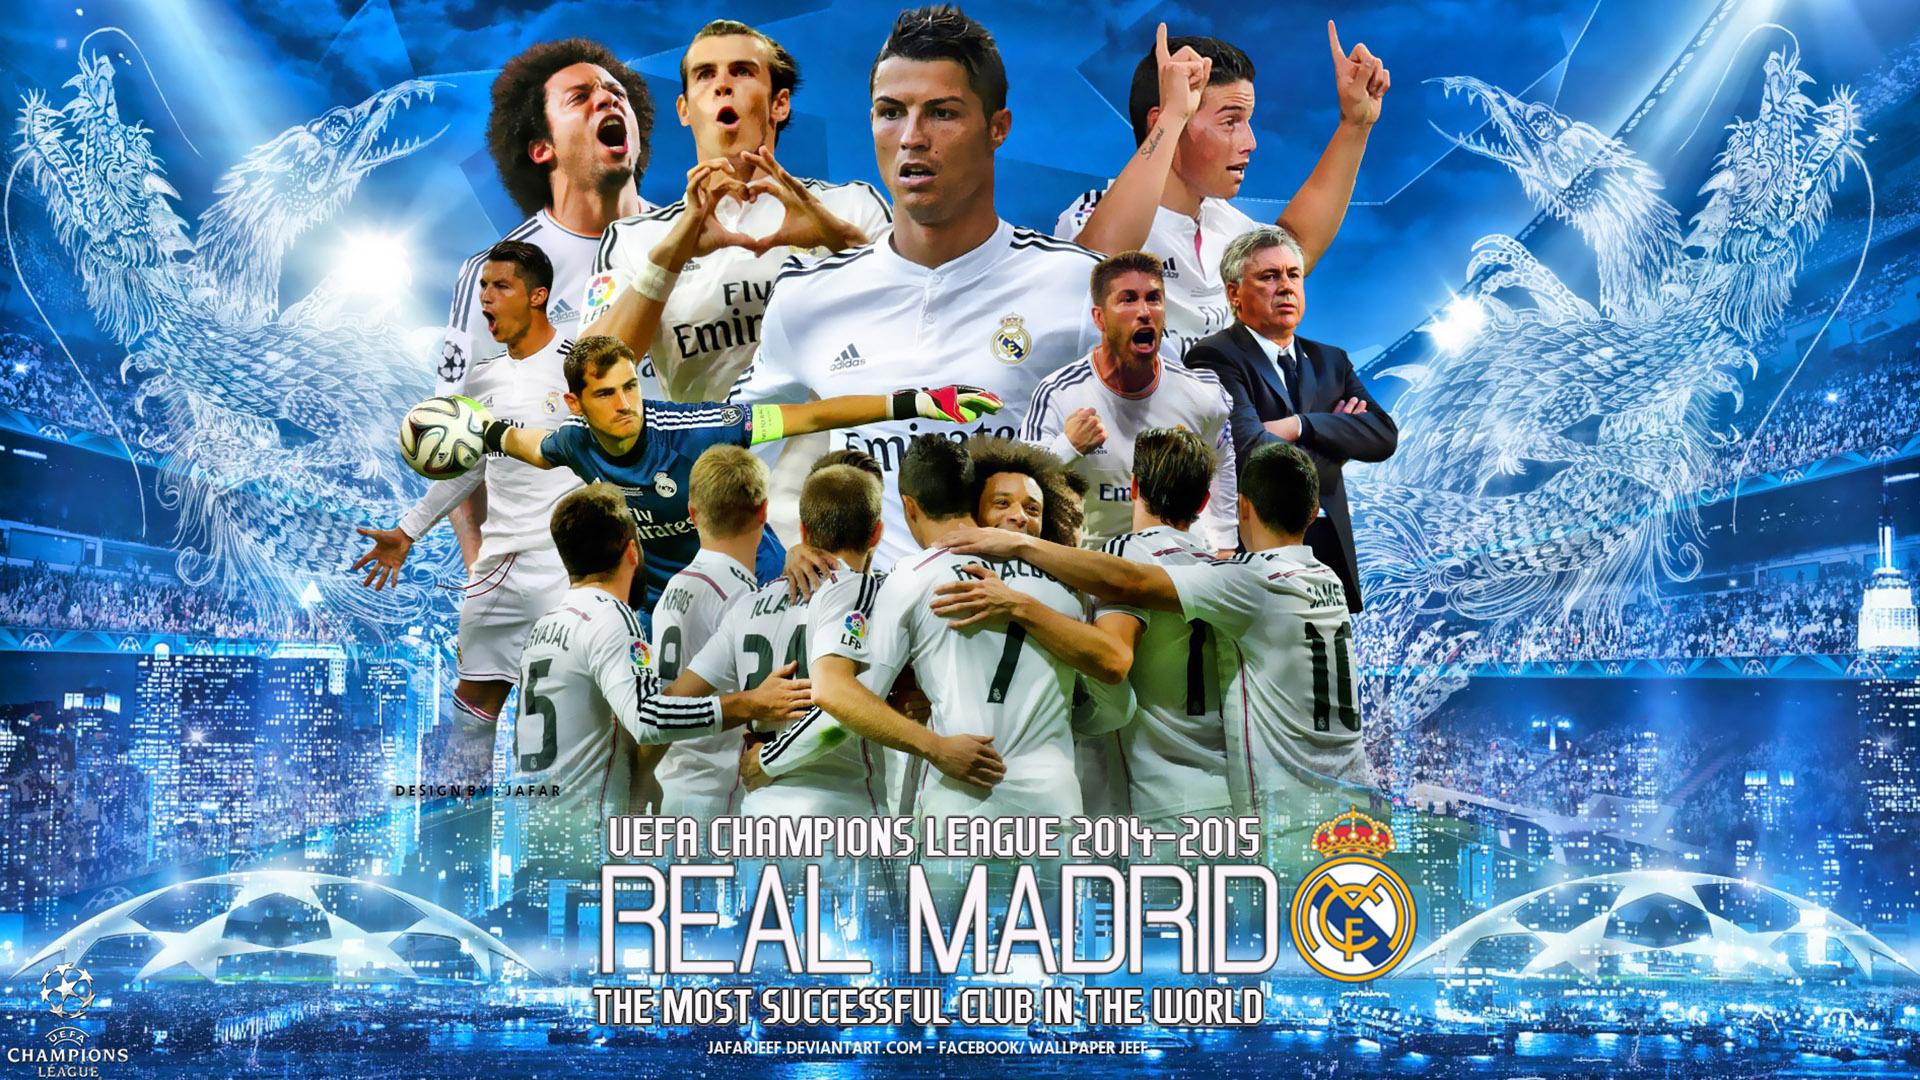 Wallpaper Real Madrid Vs Barcelona 2016